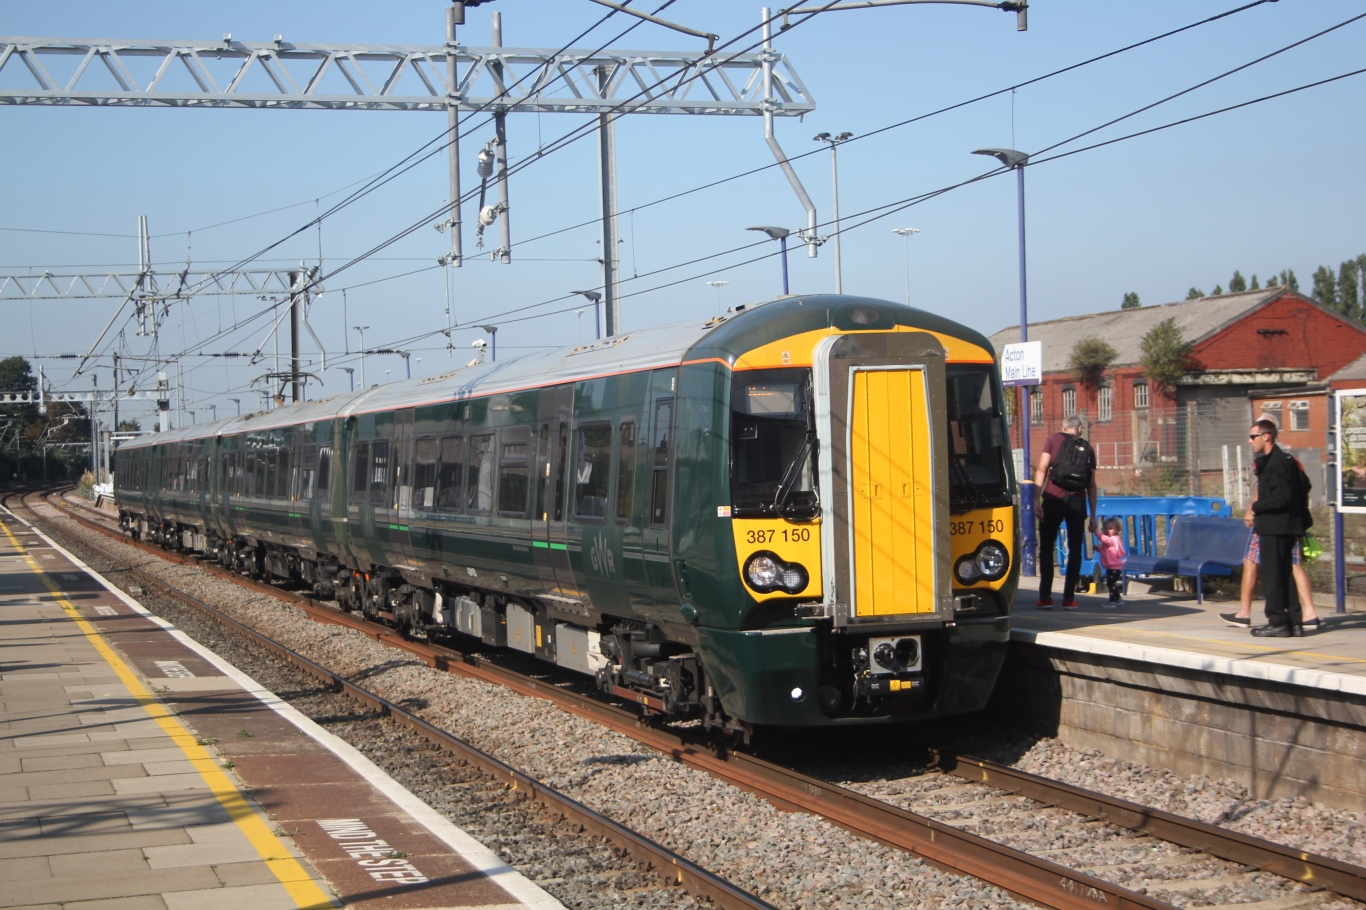 Acton Main Line - GWR 387150 Paddington service.JPG